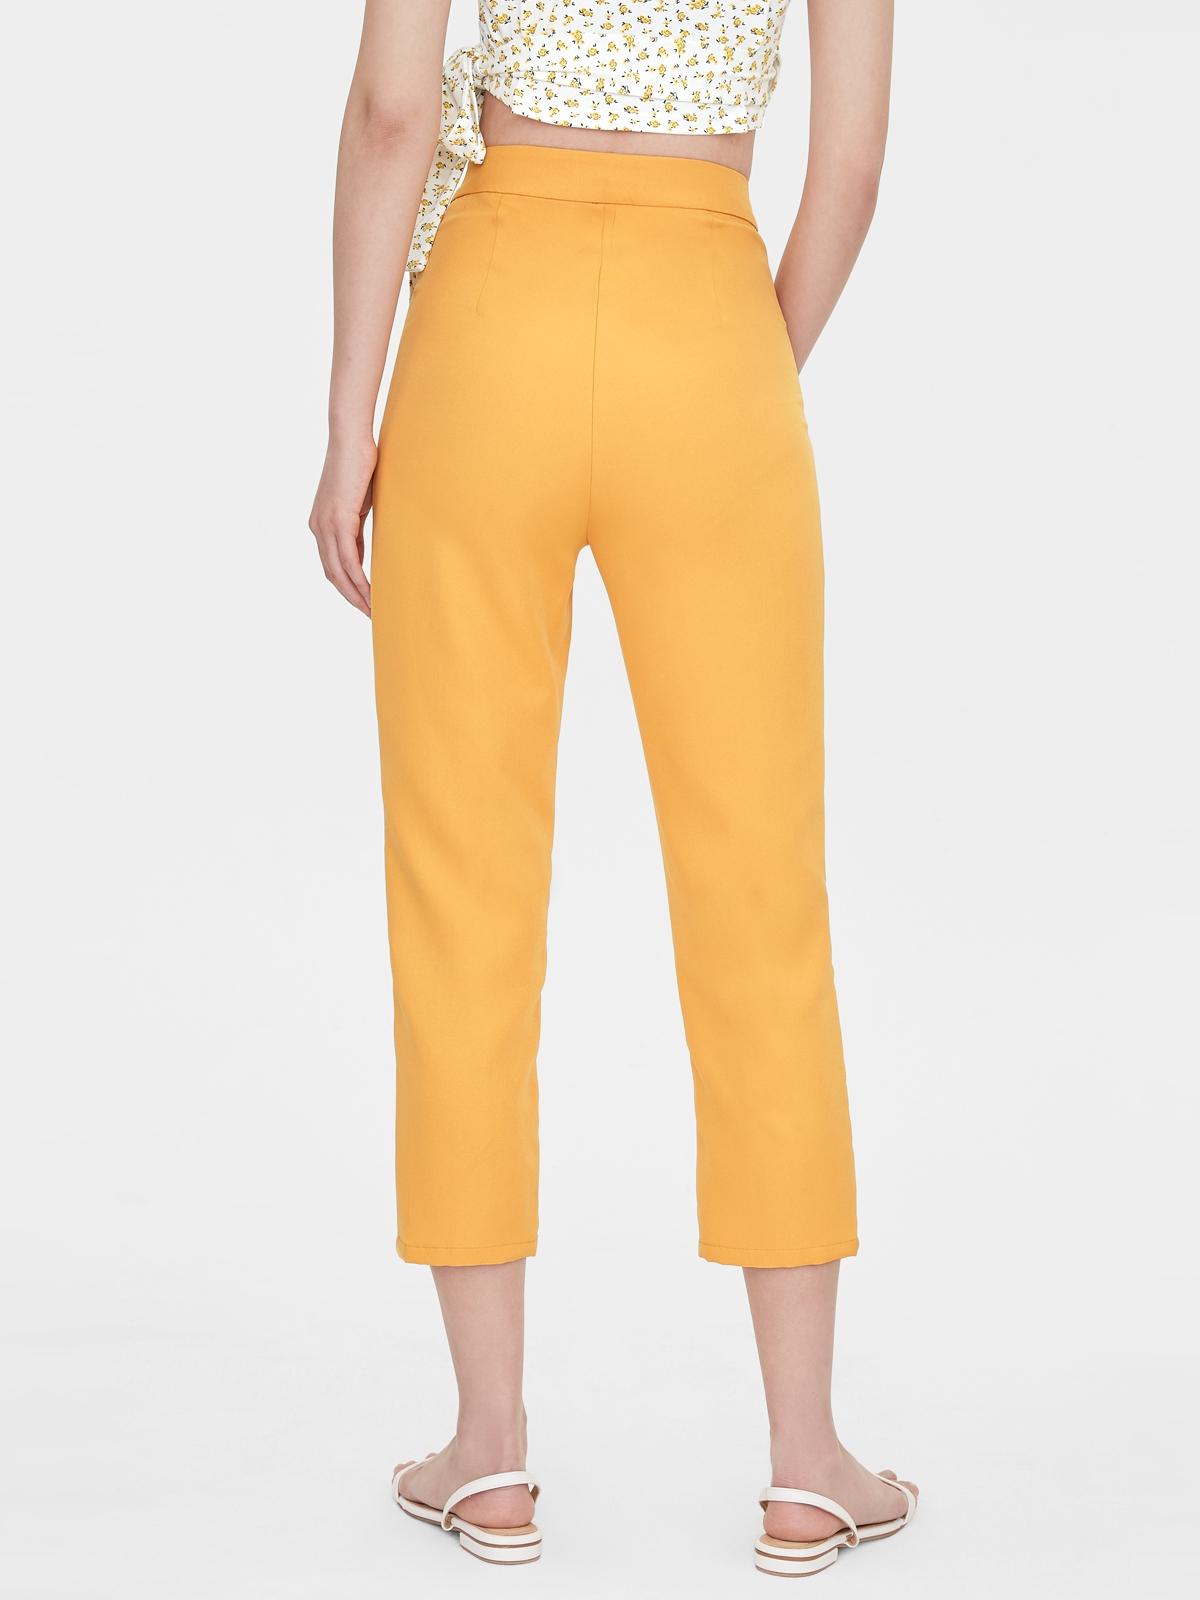 Cropped Skinny Cigarette Pants Mustard